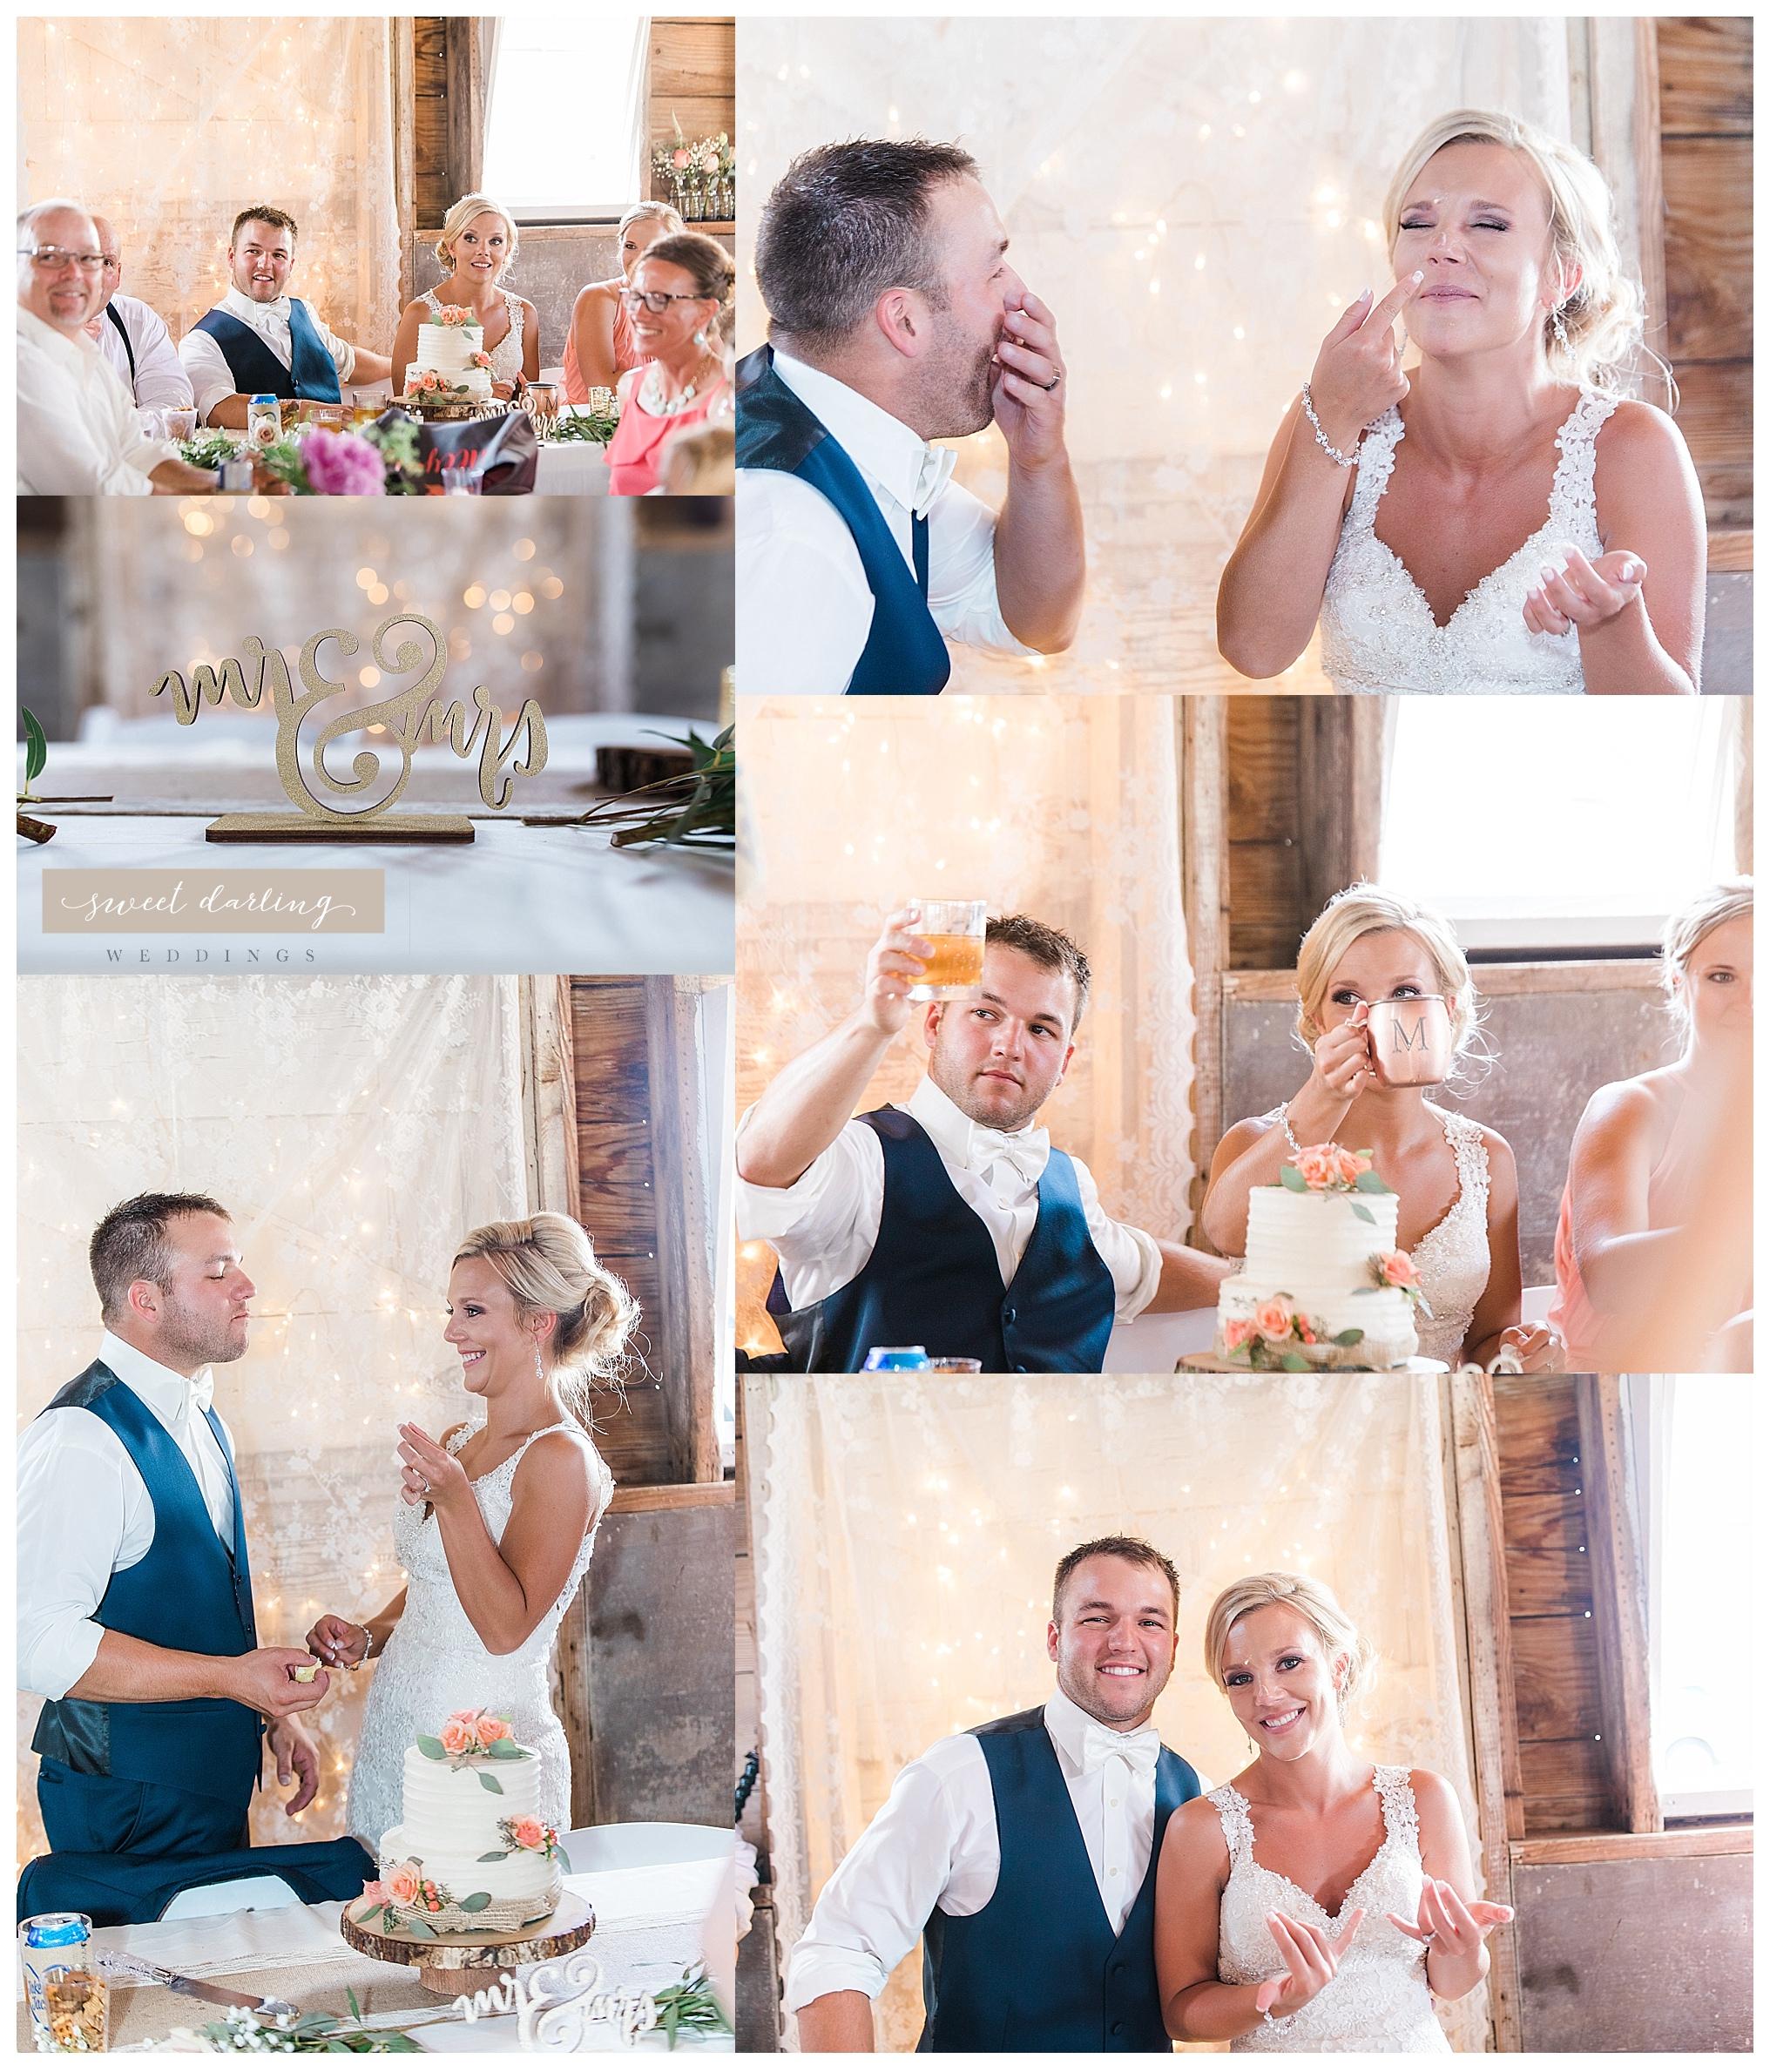 Paxton-illinois-engelbrecht-farmstead-romantic-wedding-photographer-sweet-darling-weddings_1237.jpg